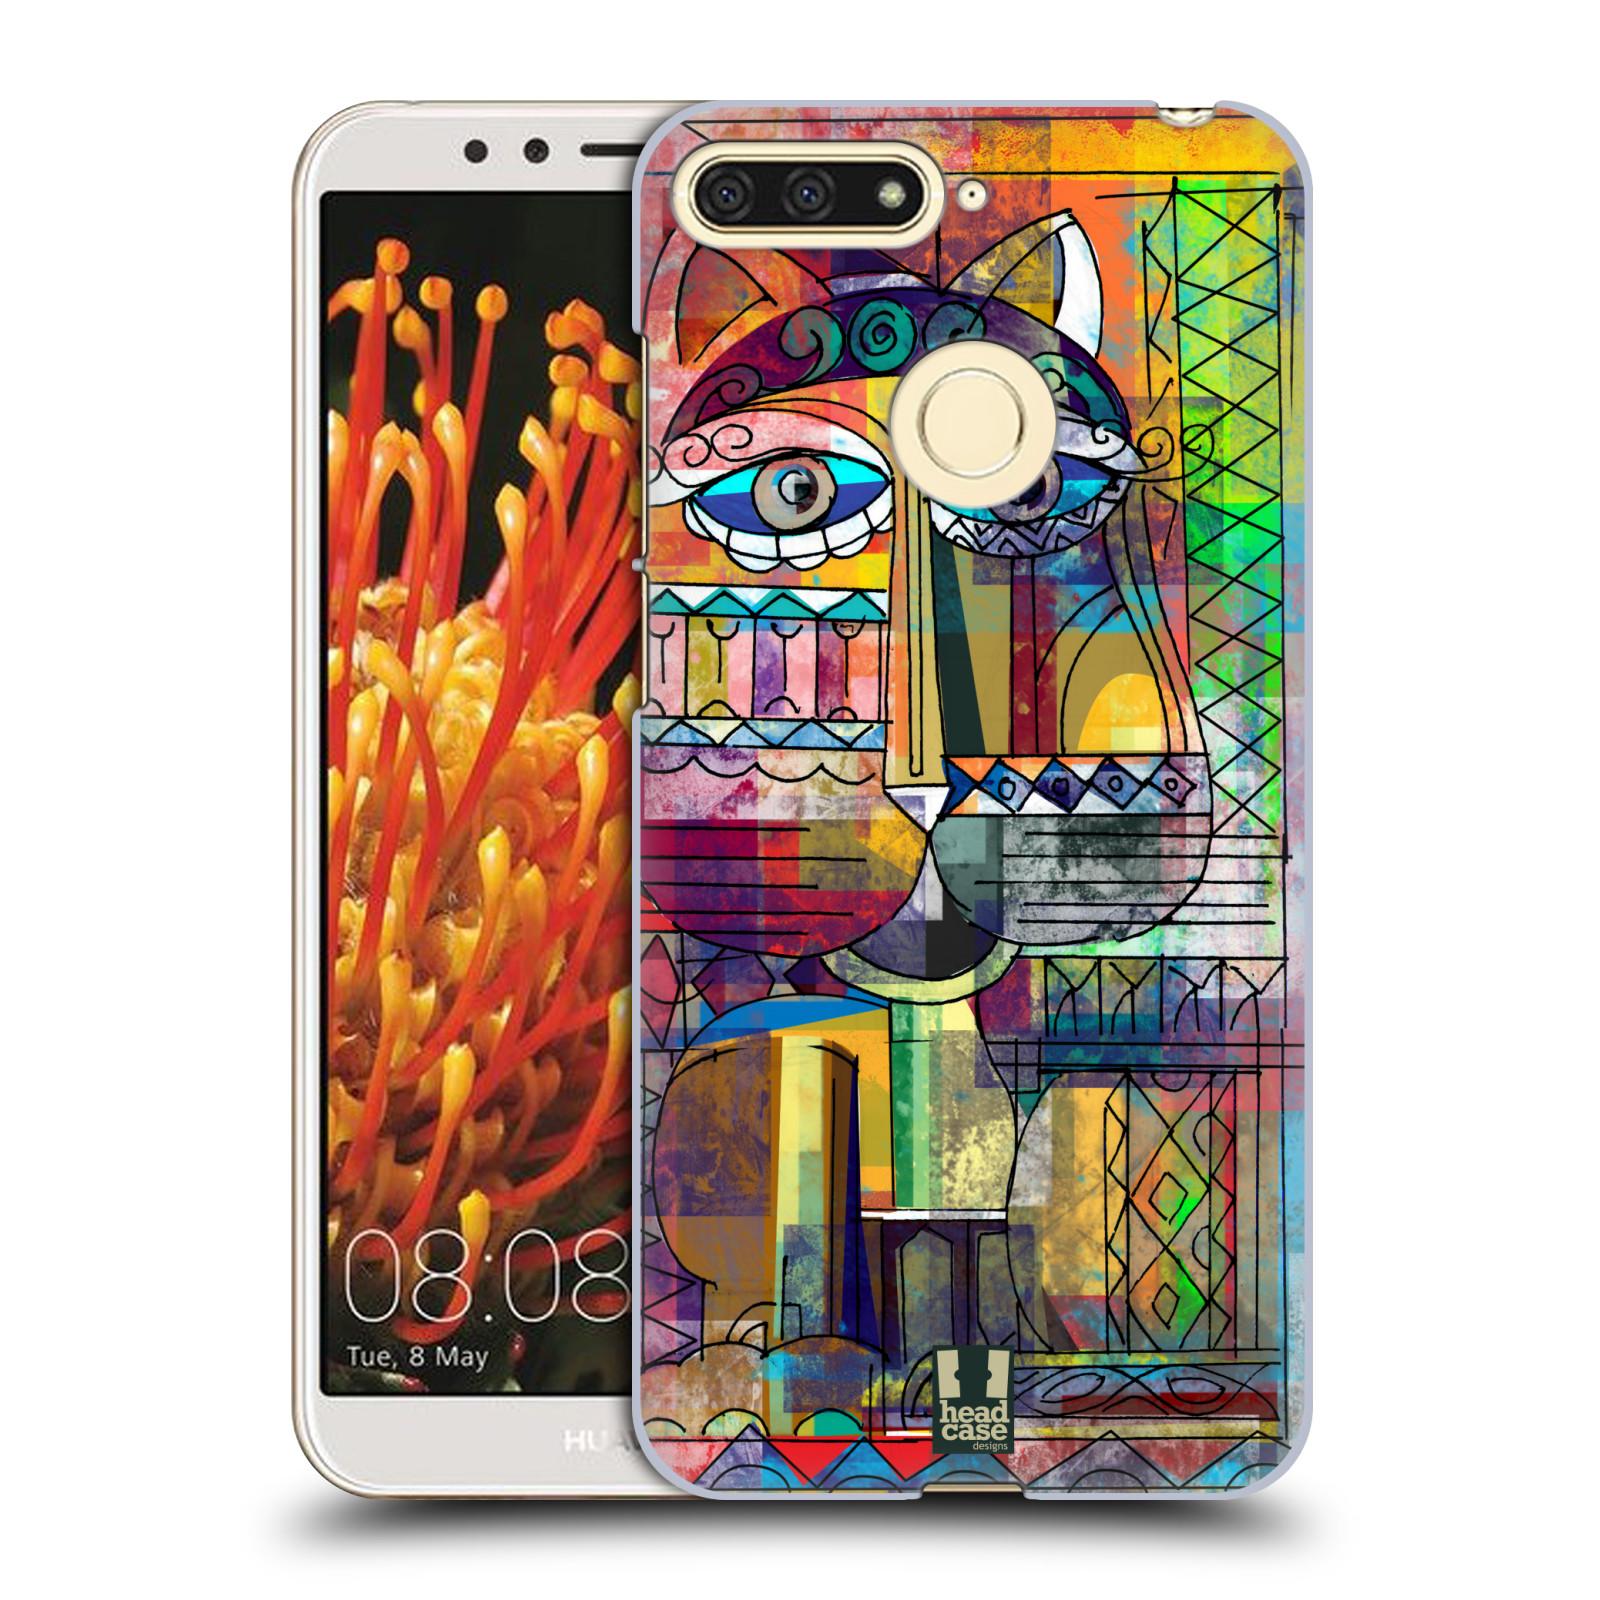 Plastové pouzdro na mobil Huawei Y6 Prime 2018 - Head Case - AZTEC KORAT